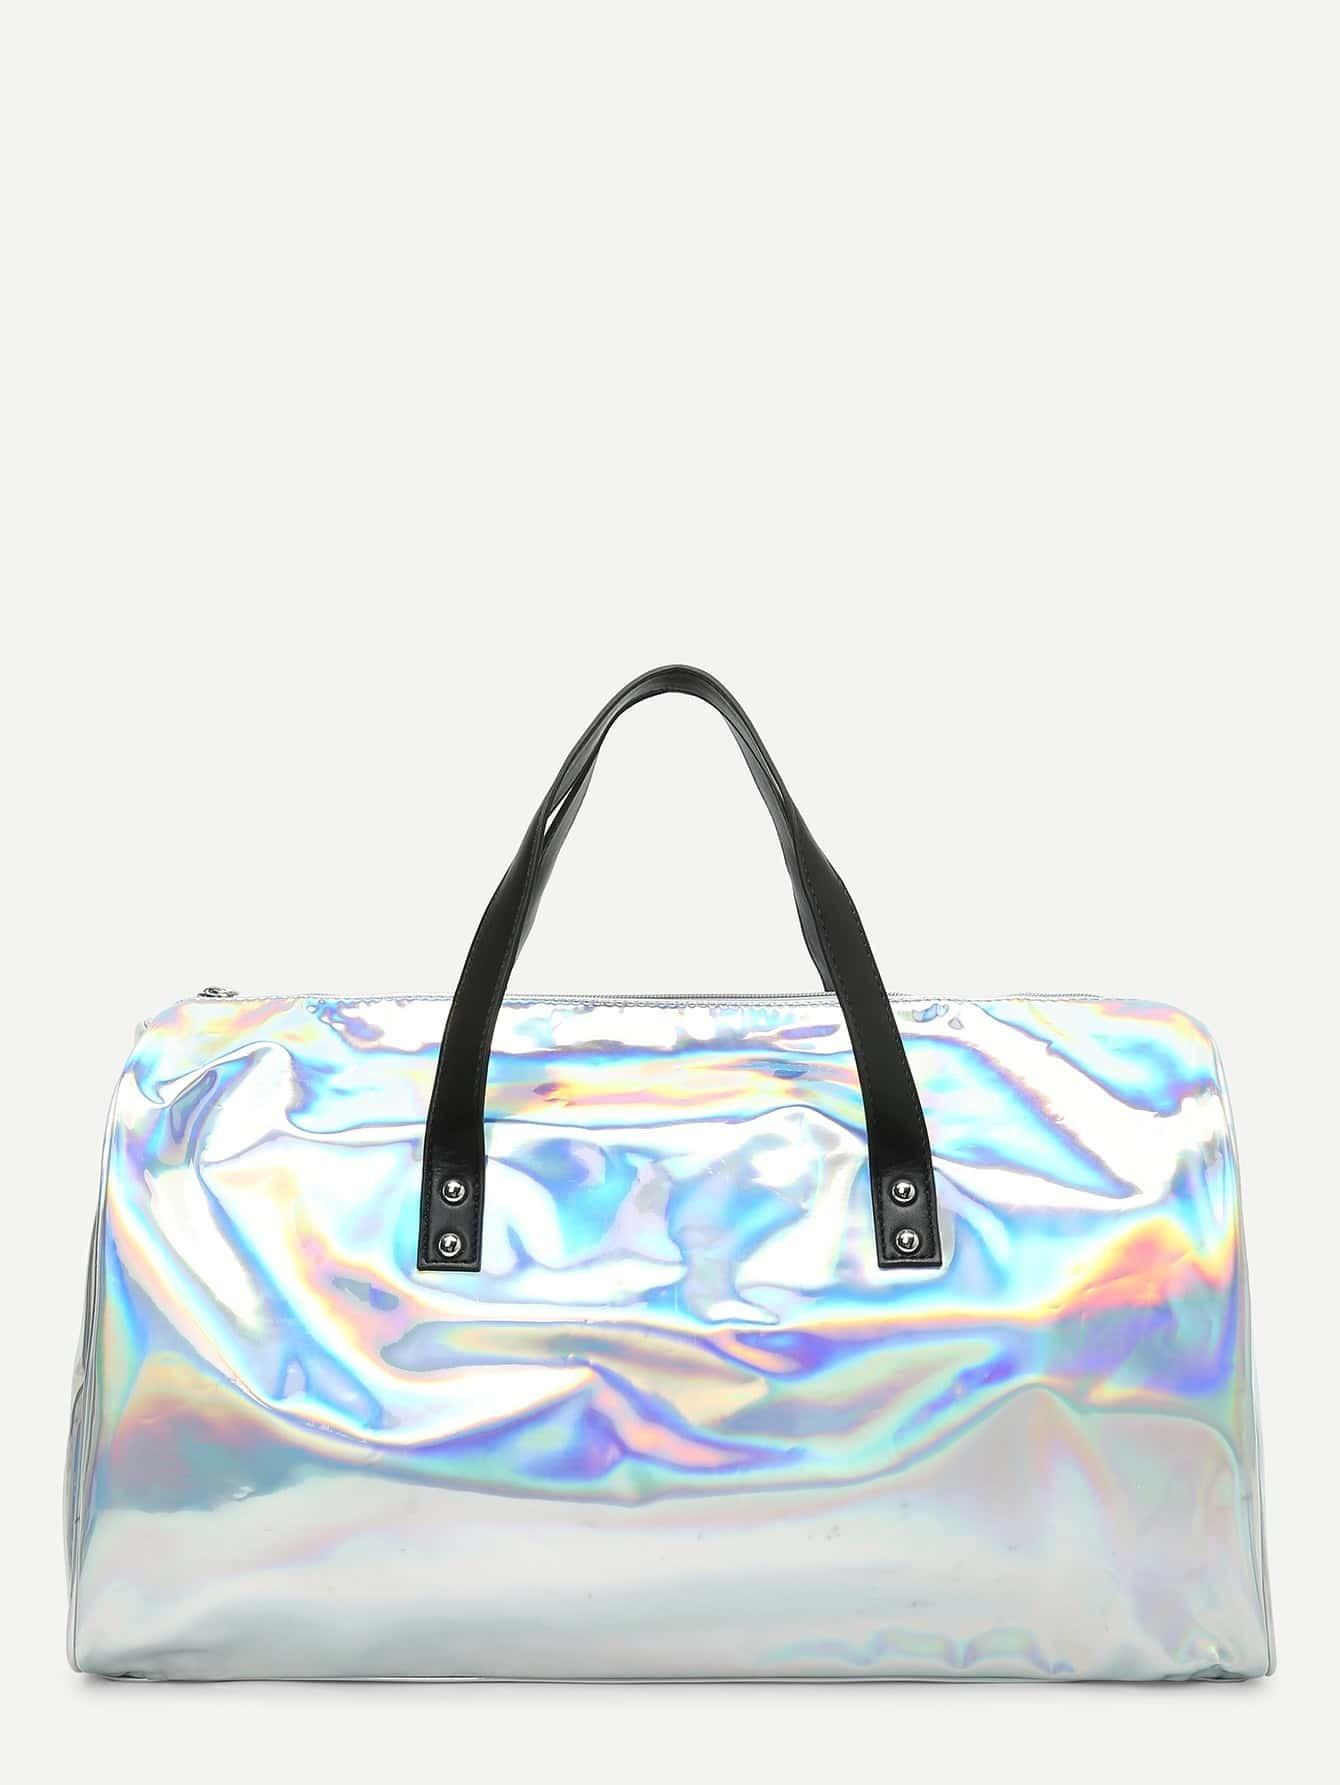 Iridescent PU Tote Bag iridescent tote bag